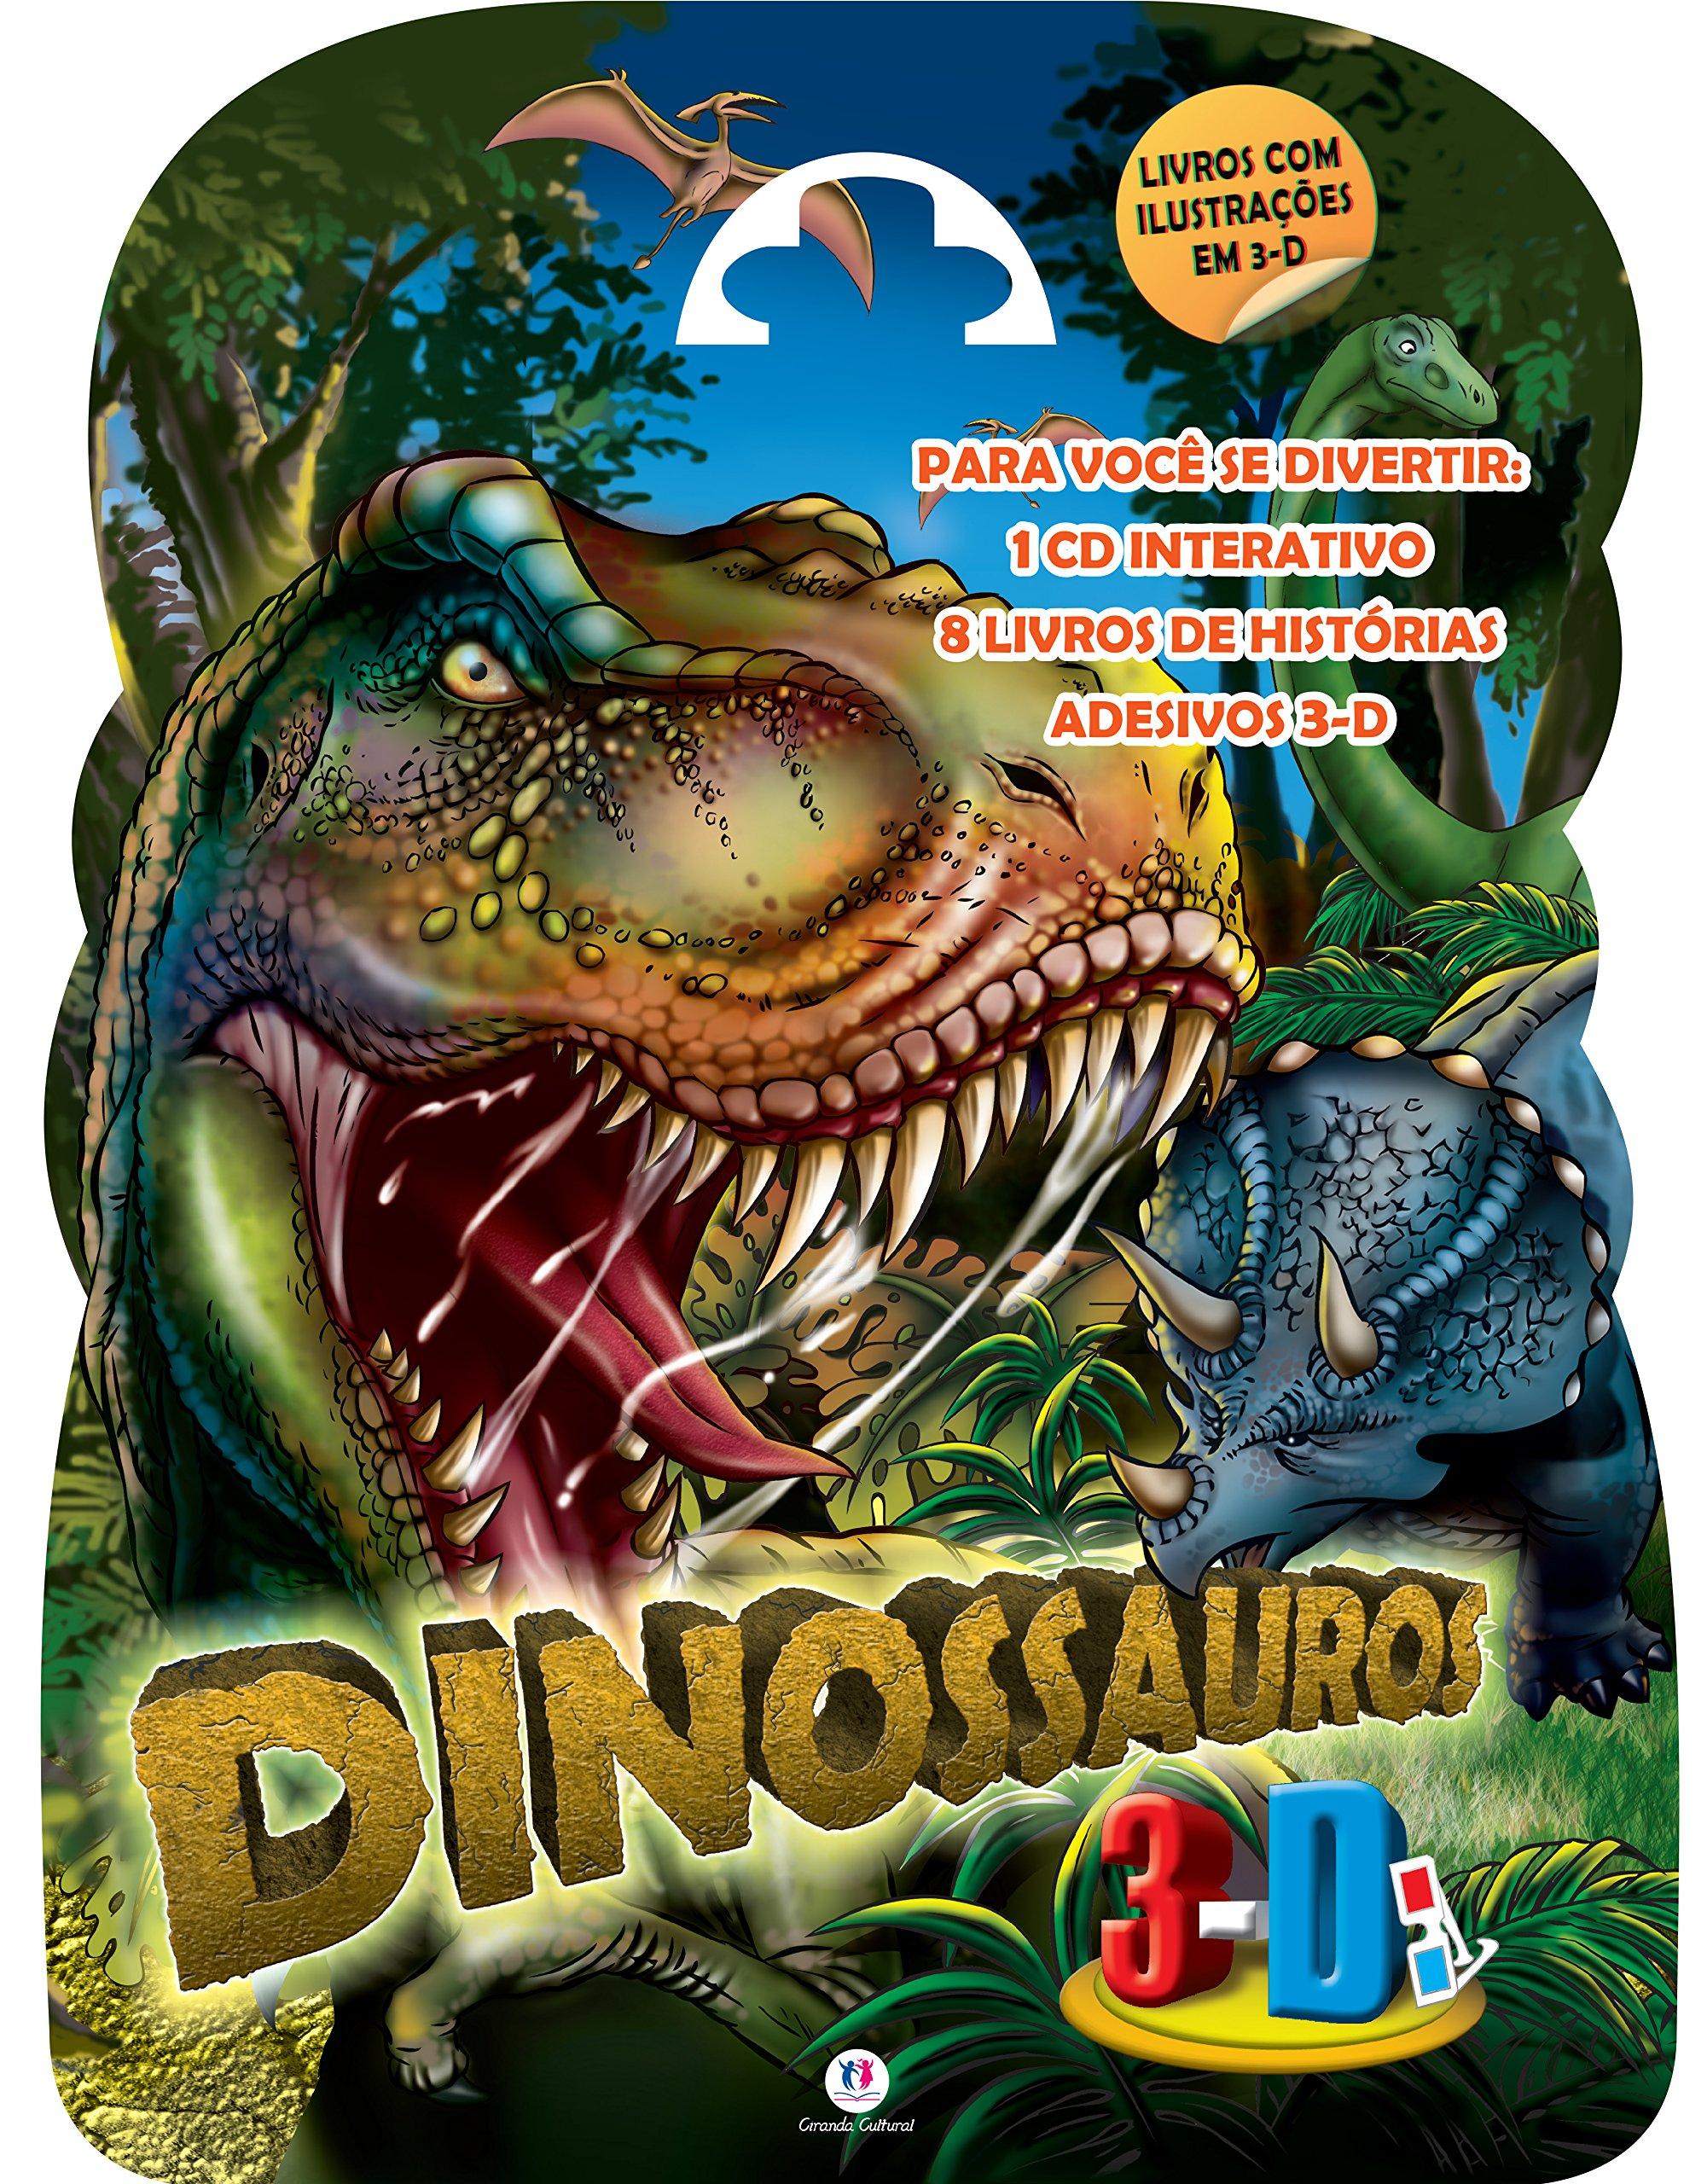 Dinossauros 3d (Portuguese Brazilian) Pamphlet – 2009